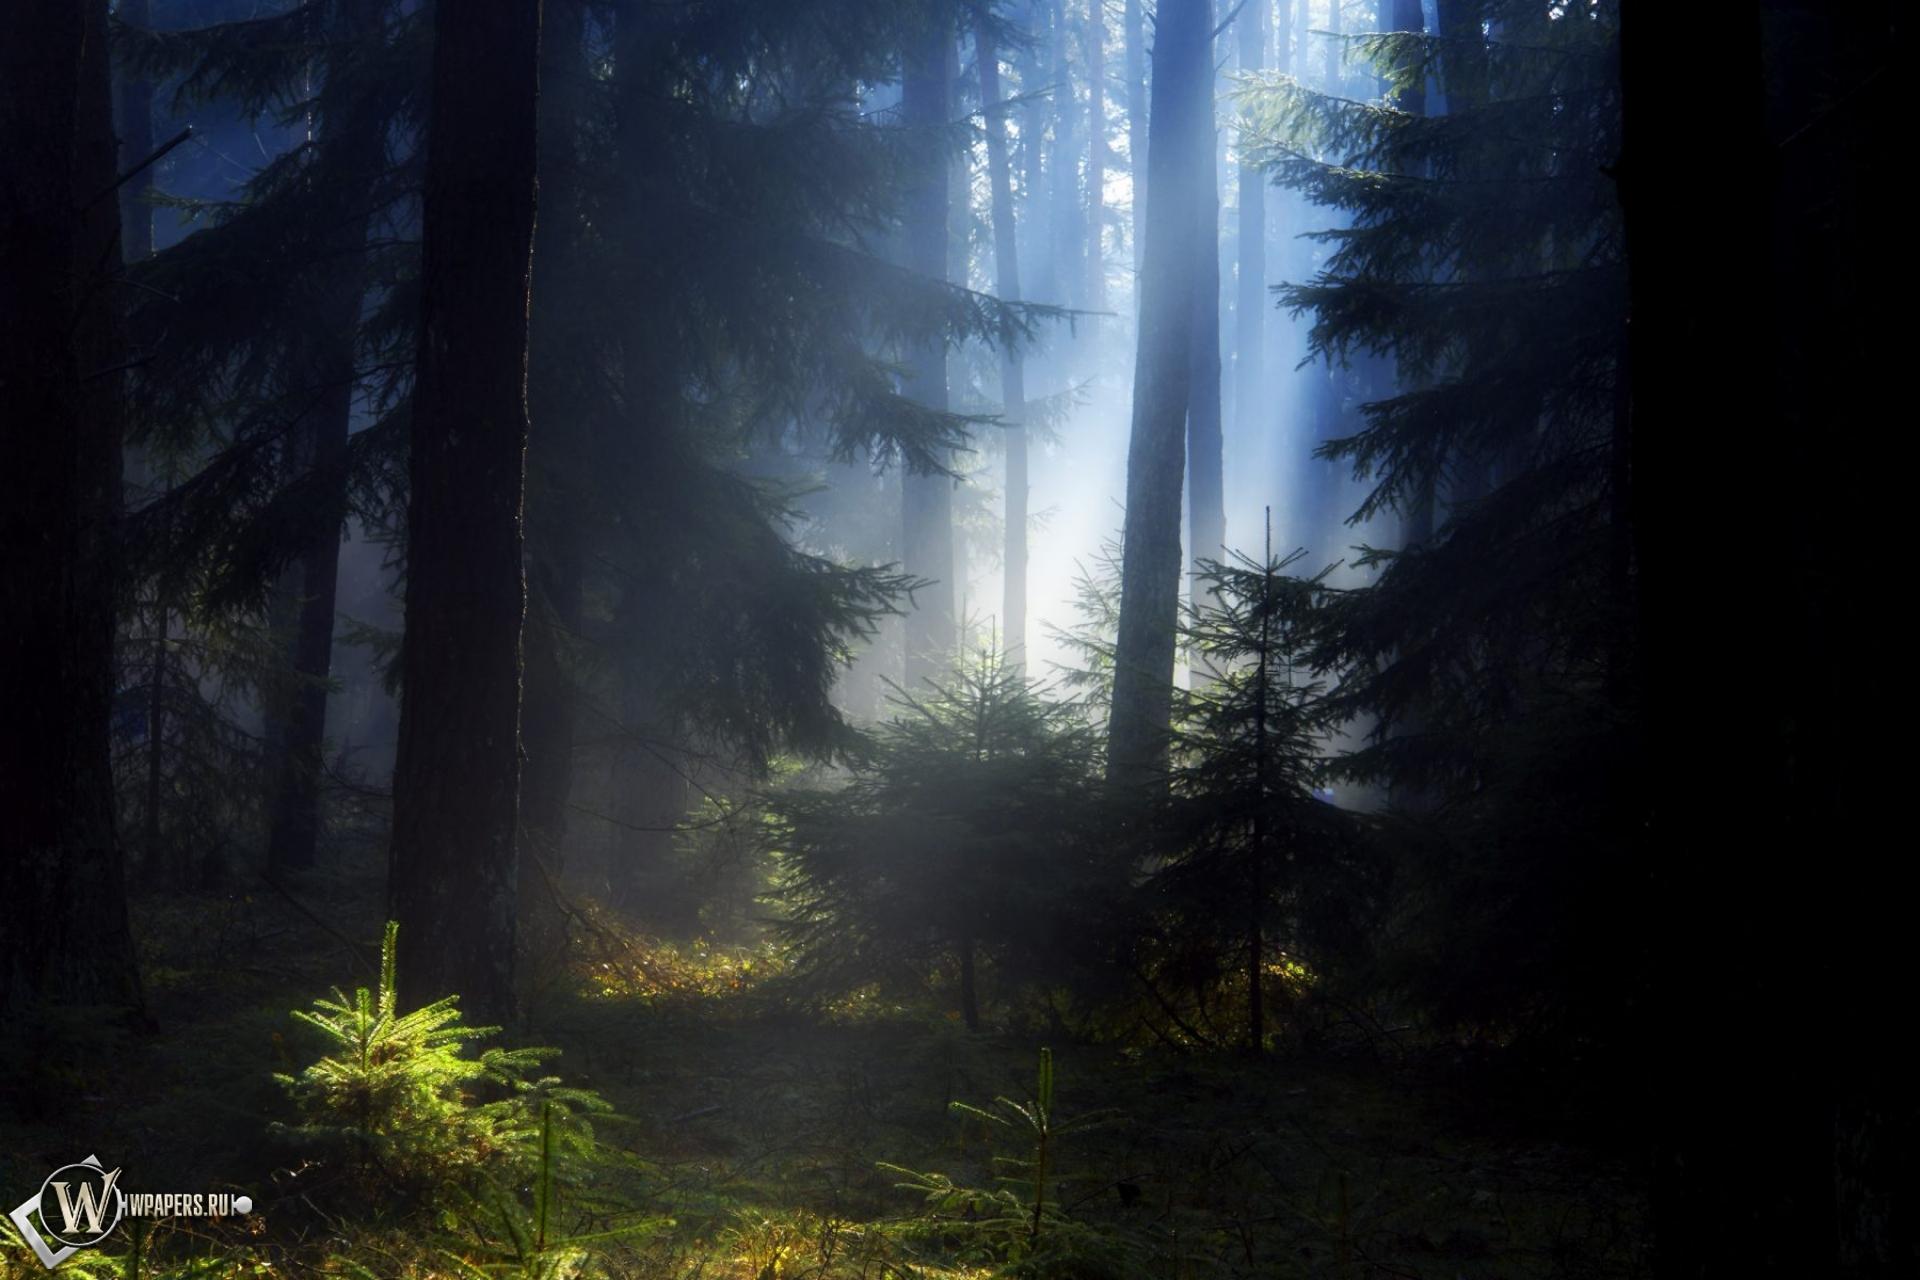 Еловый лес 1920x1280